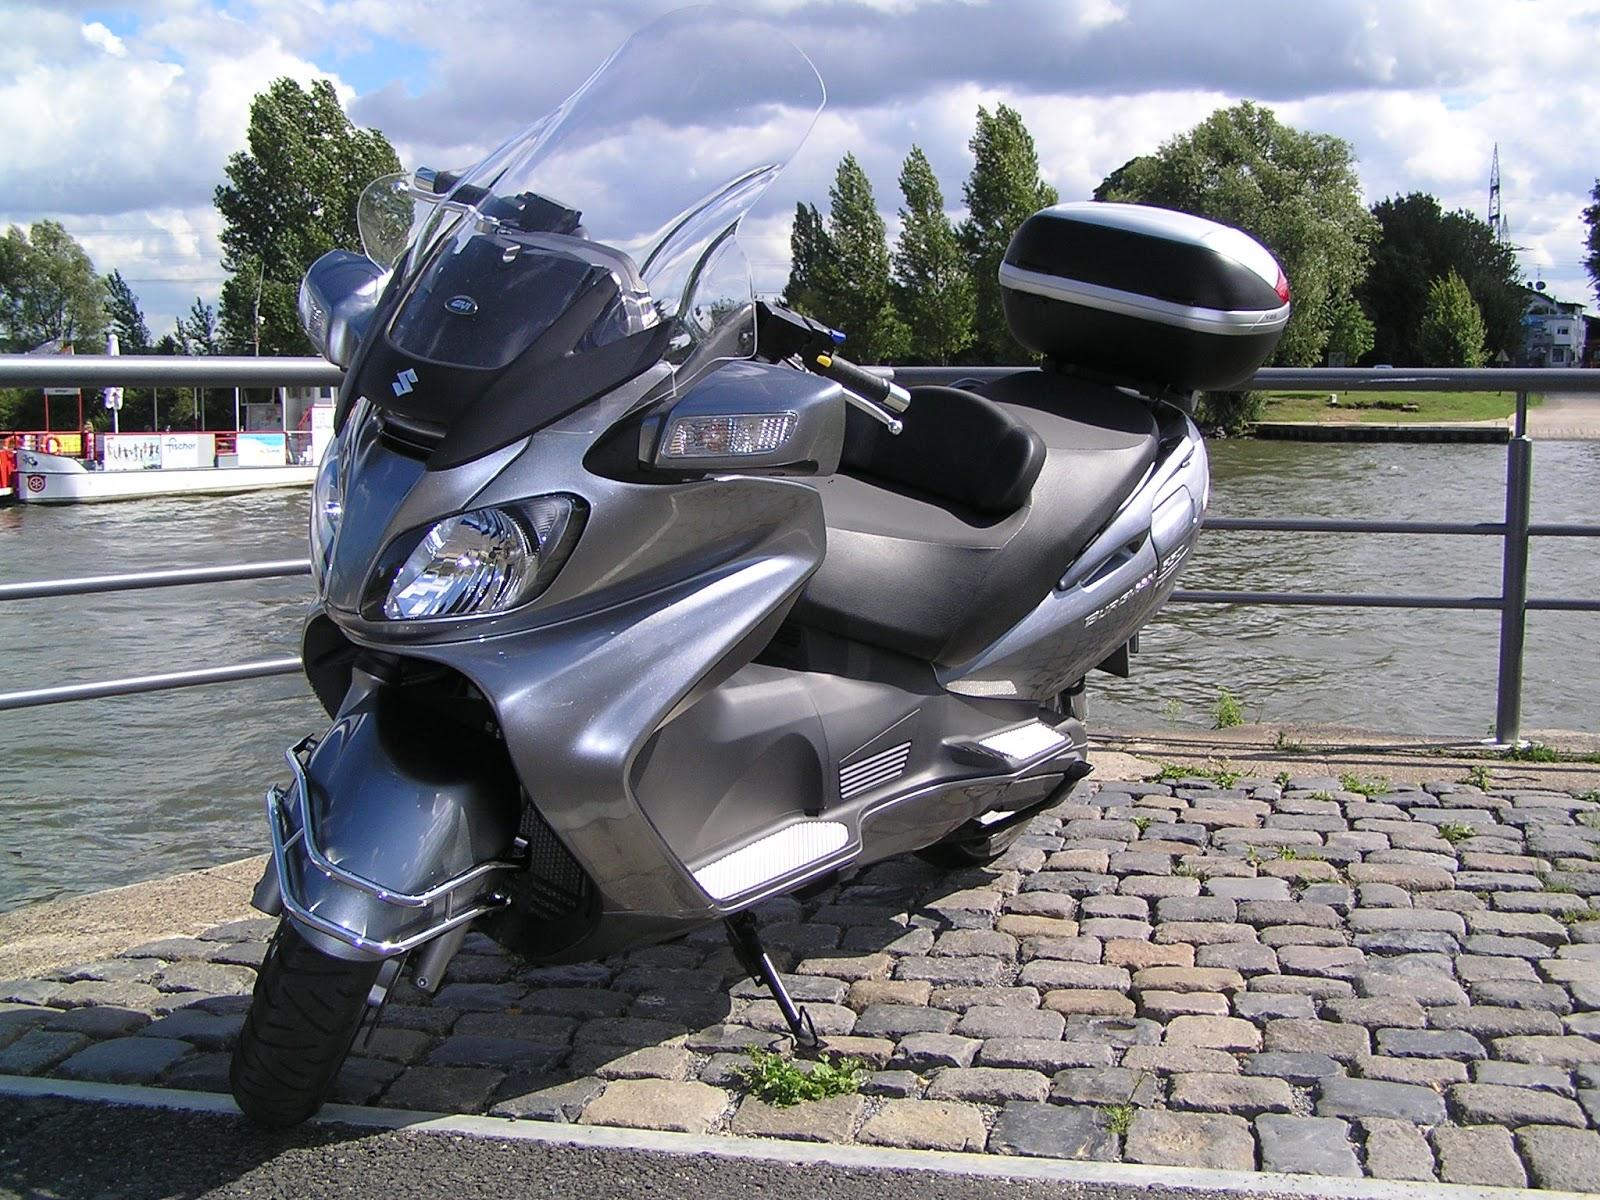 Daftar Harga Motor Matic Yamaha Dan Suzuki Tahun 2017 Di Jakarta